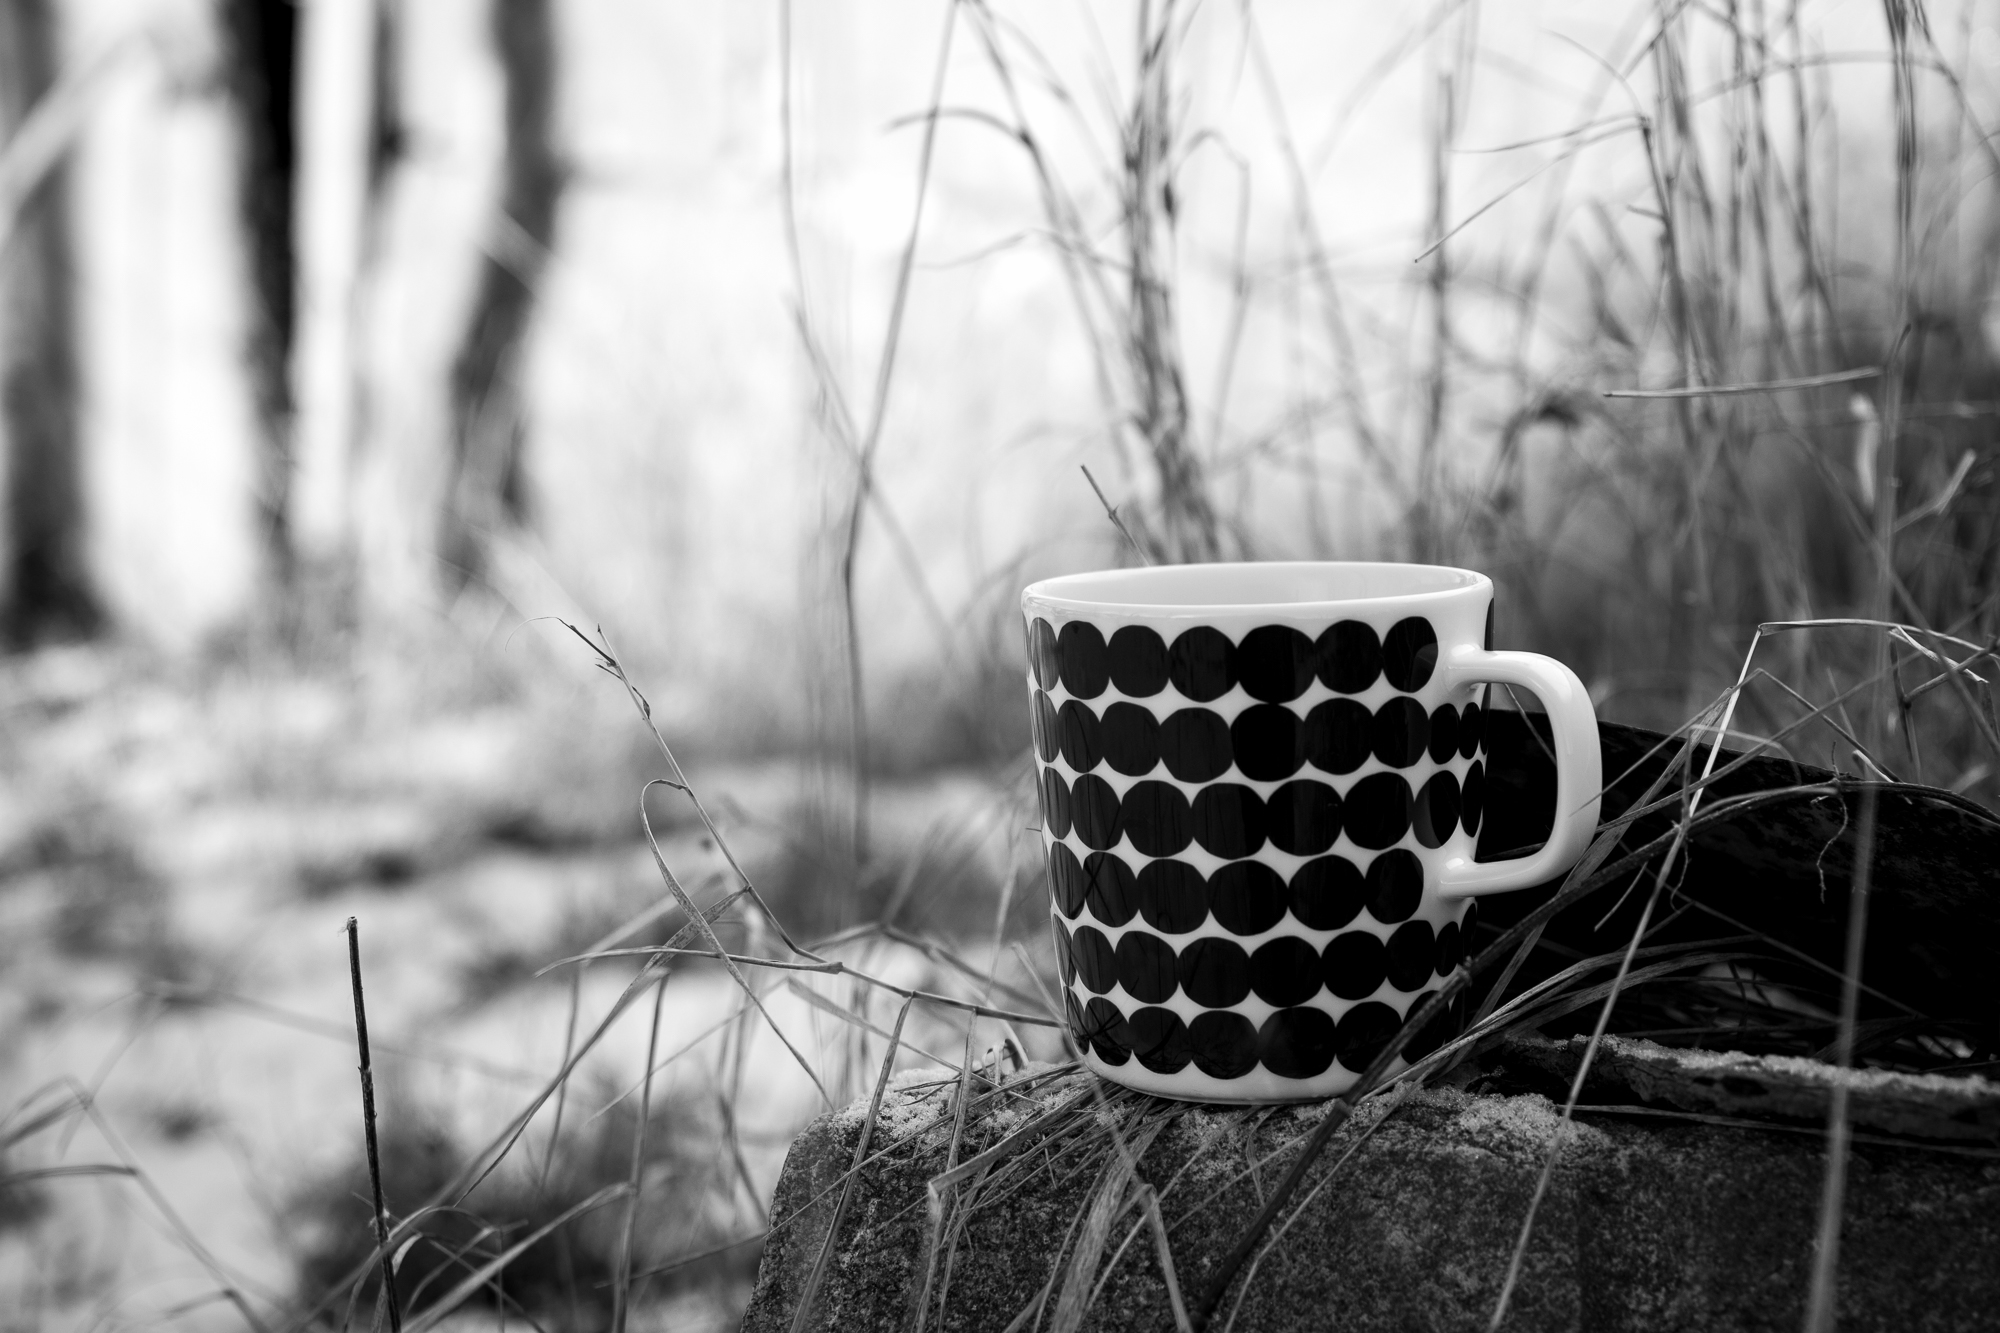 Kahvihetki auringossa / Coffee time under the sun